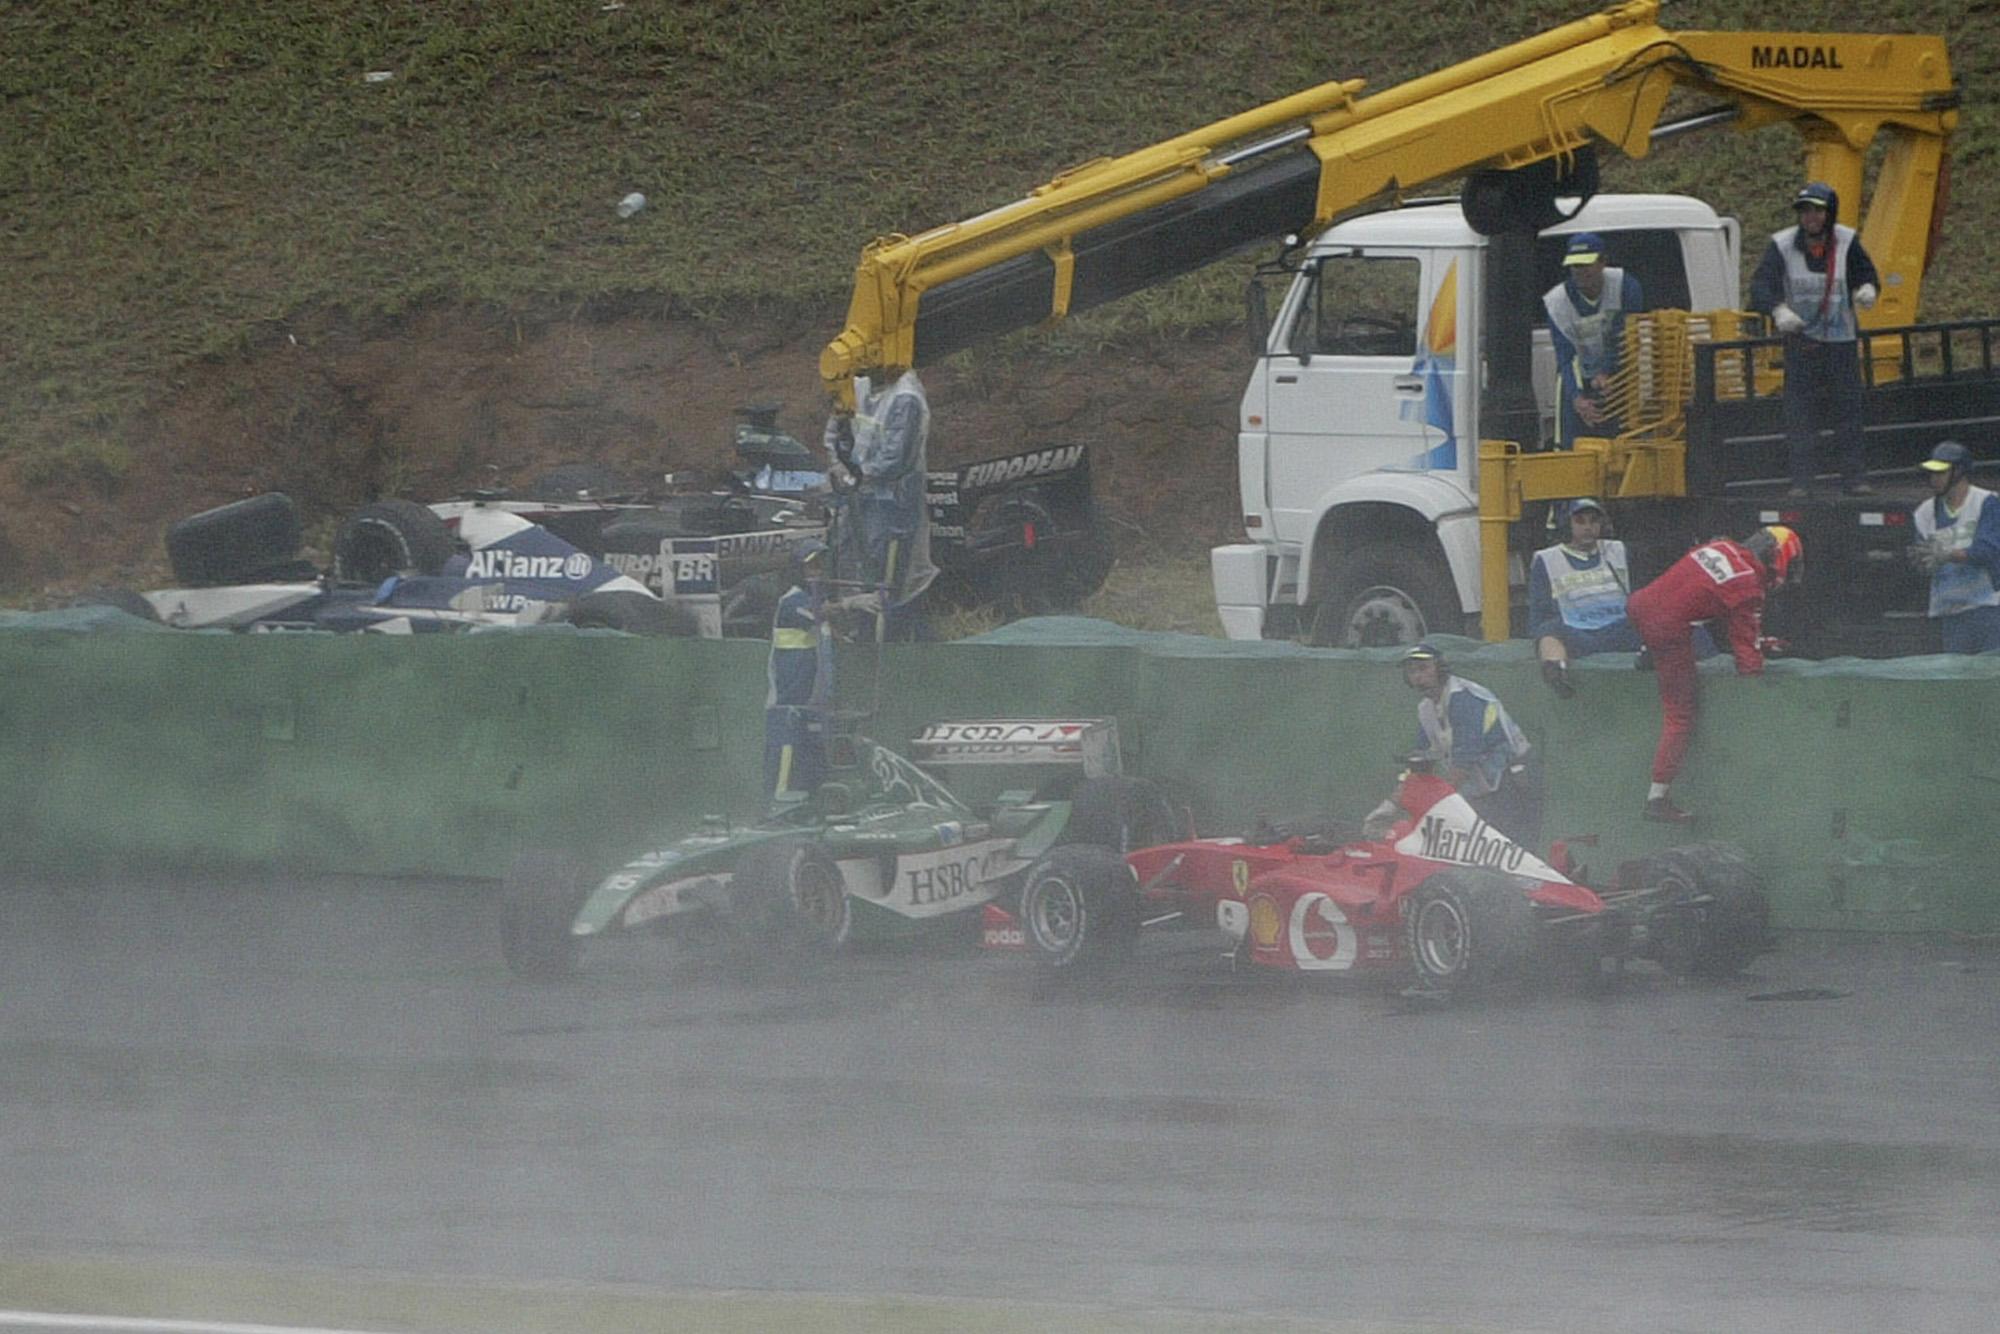 Michael Schumacher crashes out of the 2003 Brazilian Grand Prix